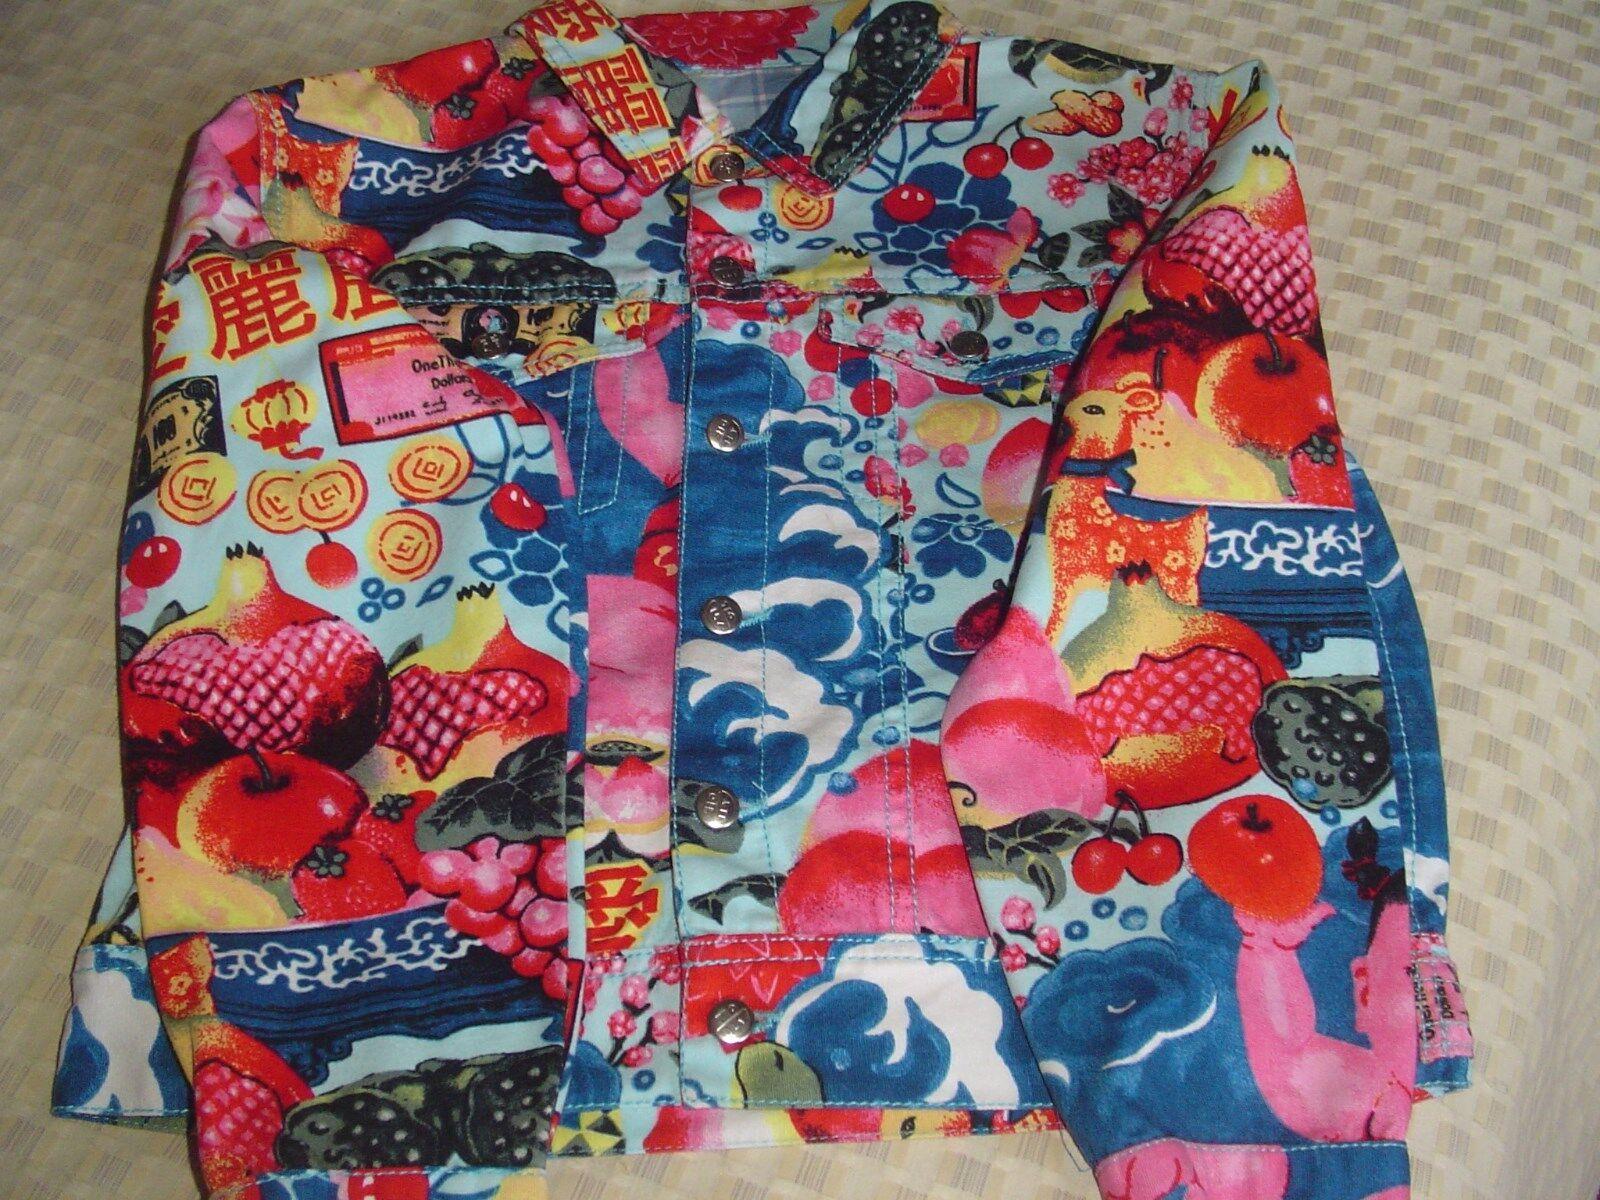 GANT Chemise L Hommes 's Shirt Taille L Chemise 41 16